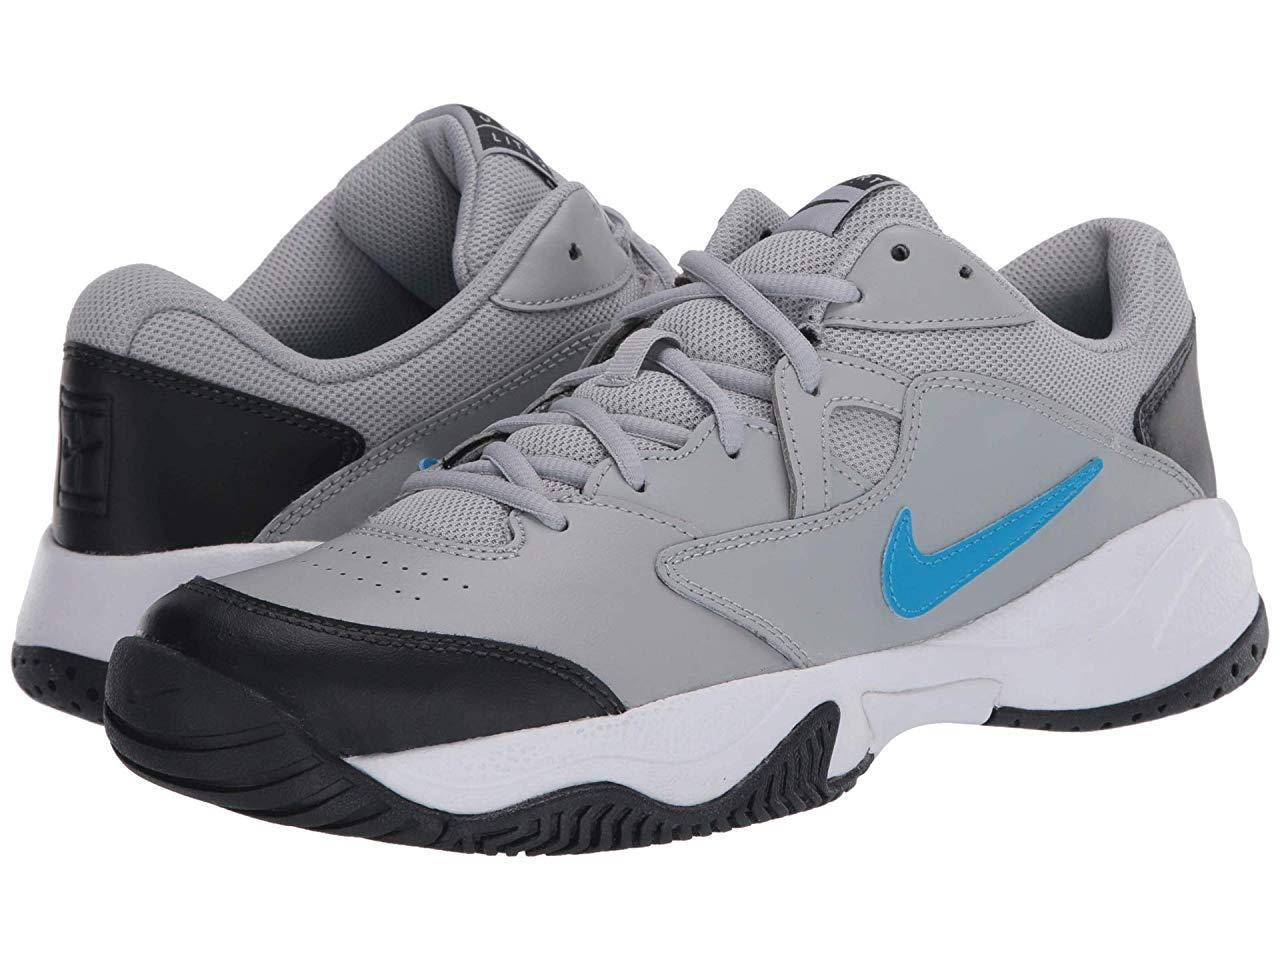 Кроссовки/Кеды Nike Court Lite 2 Light Smoke Grey/Blue Hero/Off Noir/White